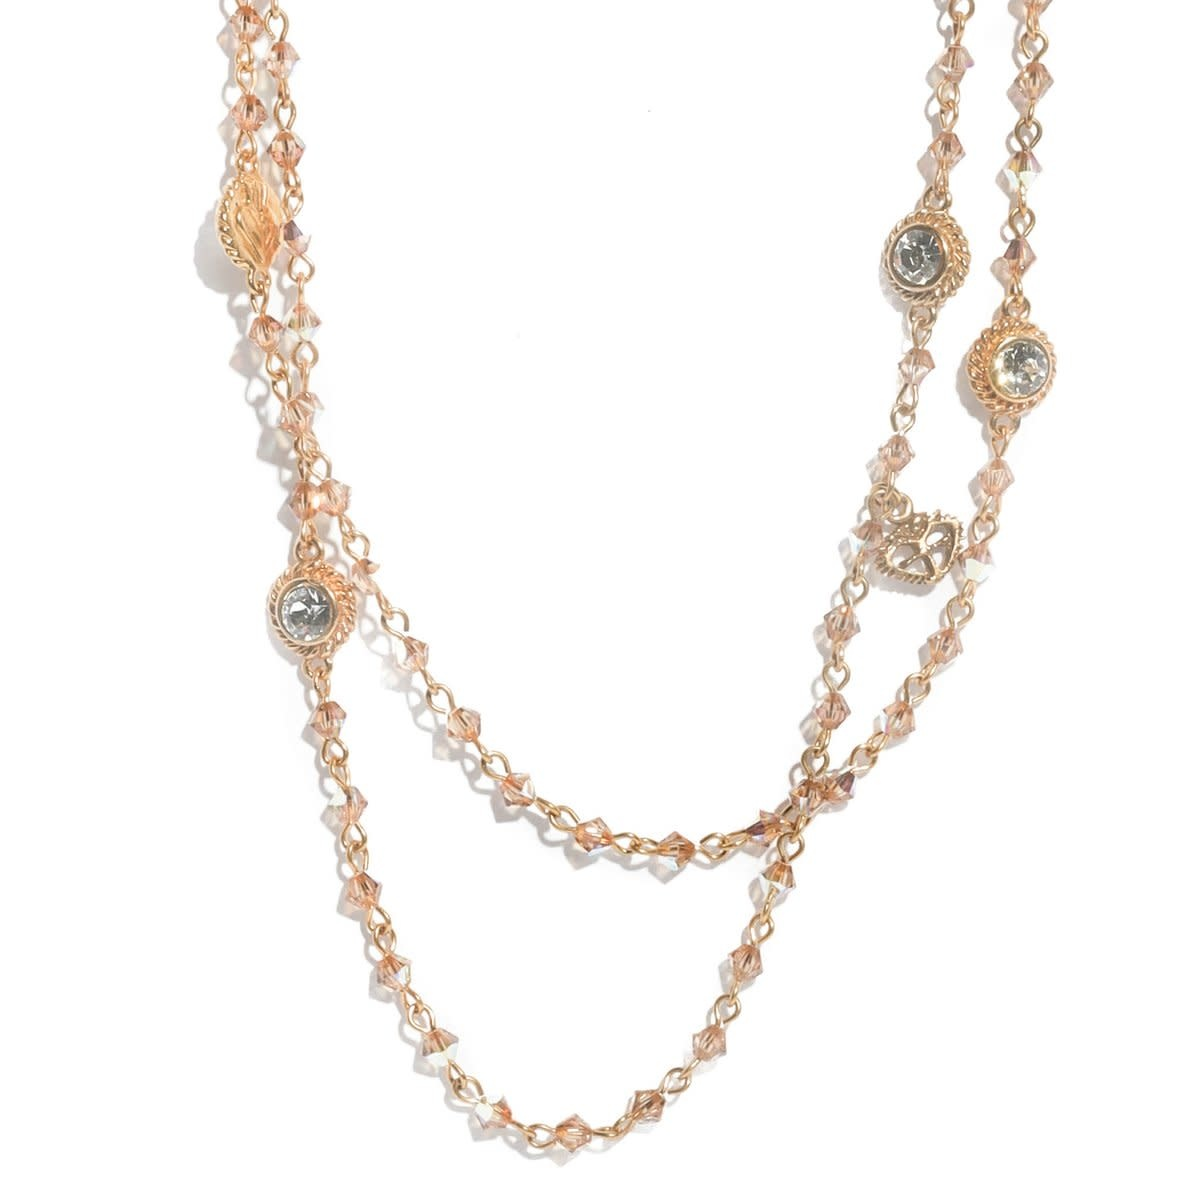 VSA Designs Wrap Necklace 4MM Bicone Gold Light Colorado Topaz